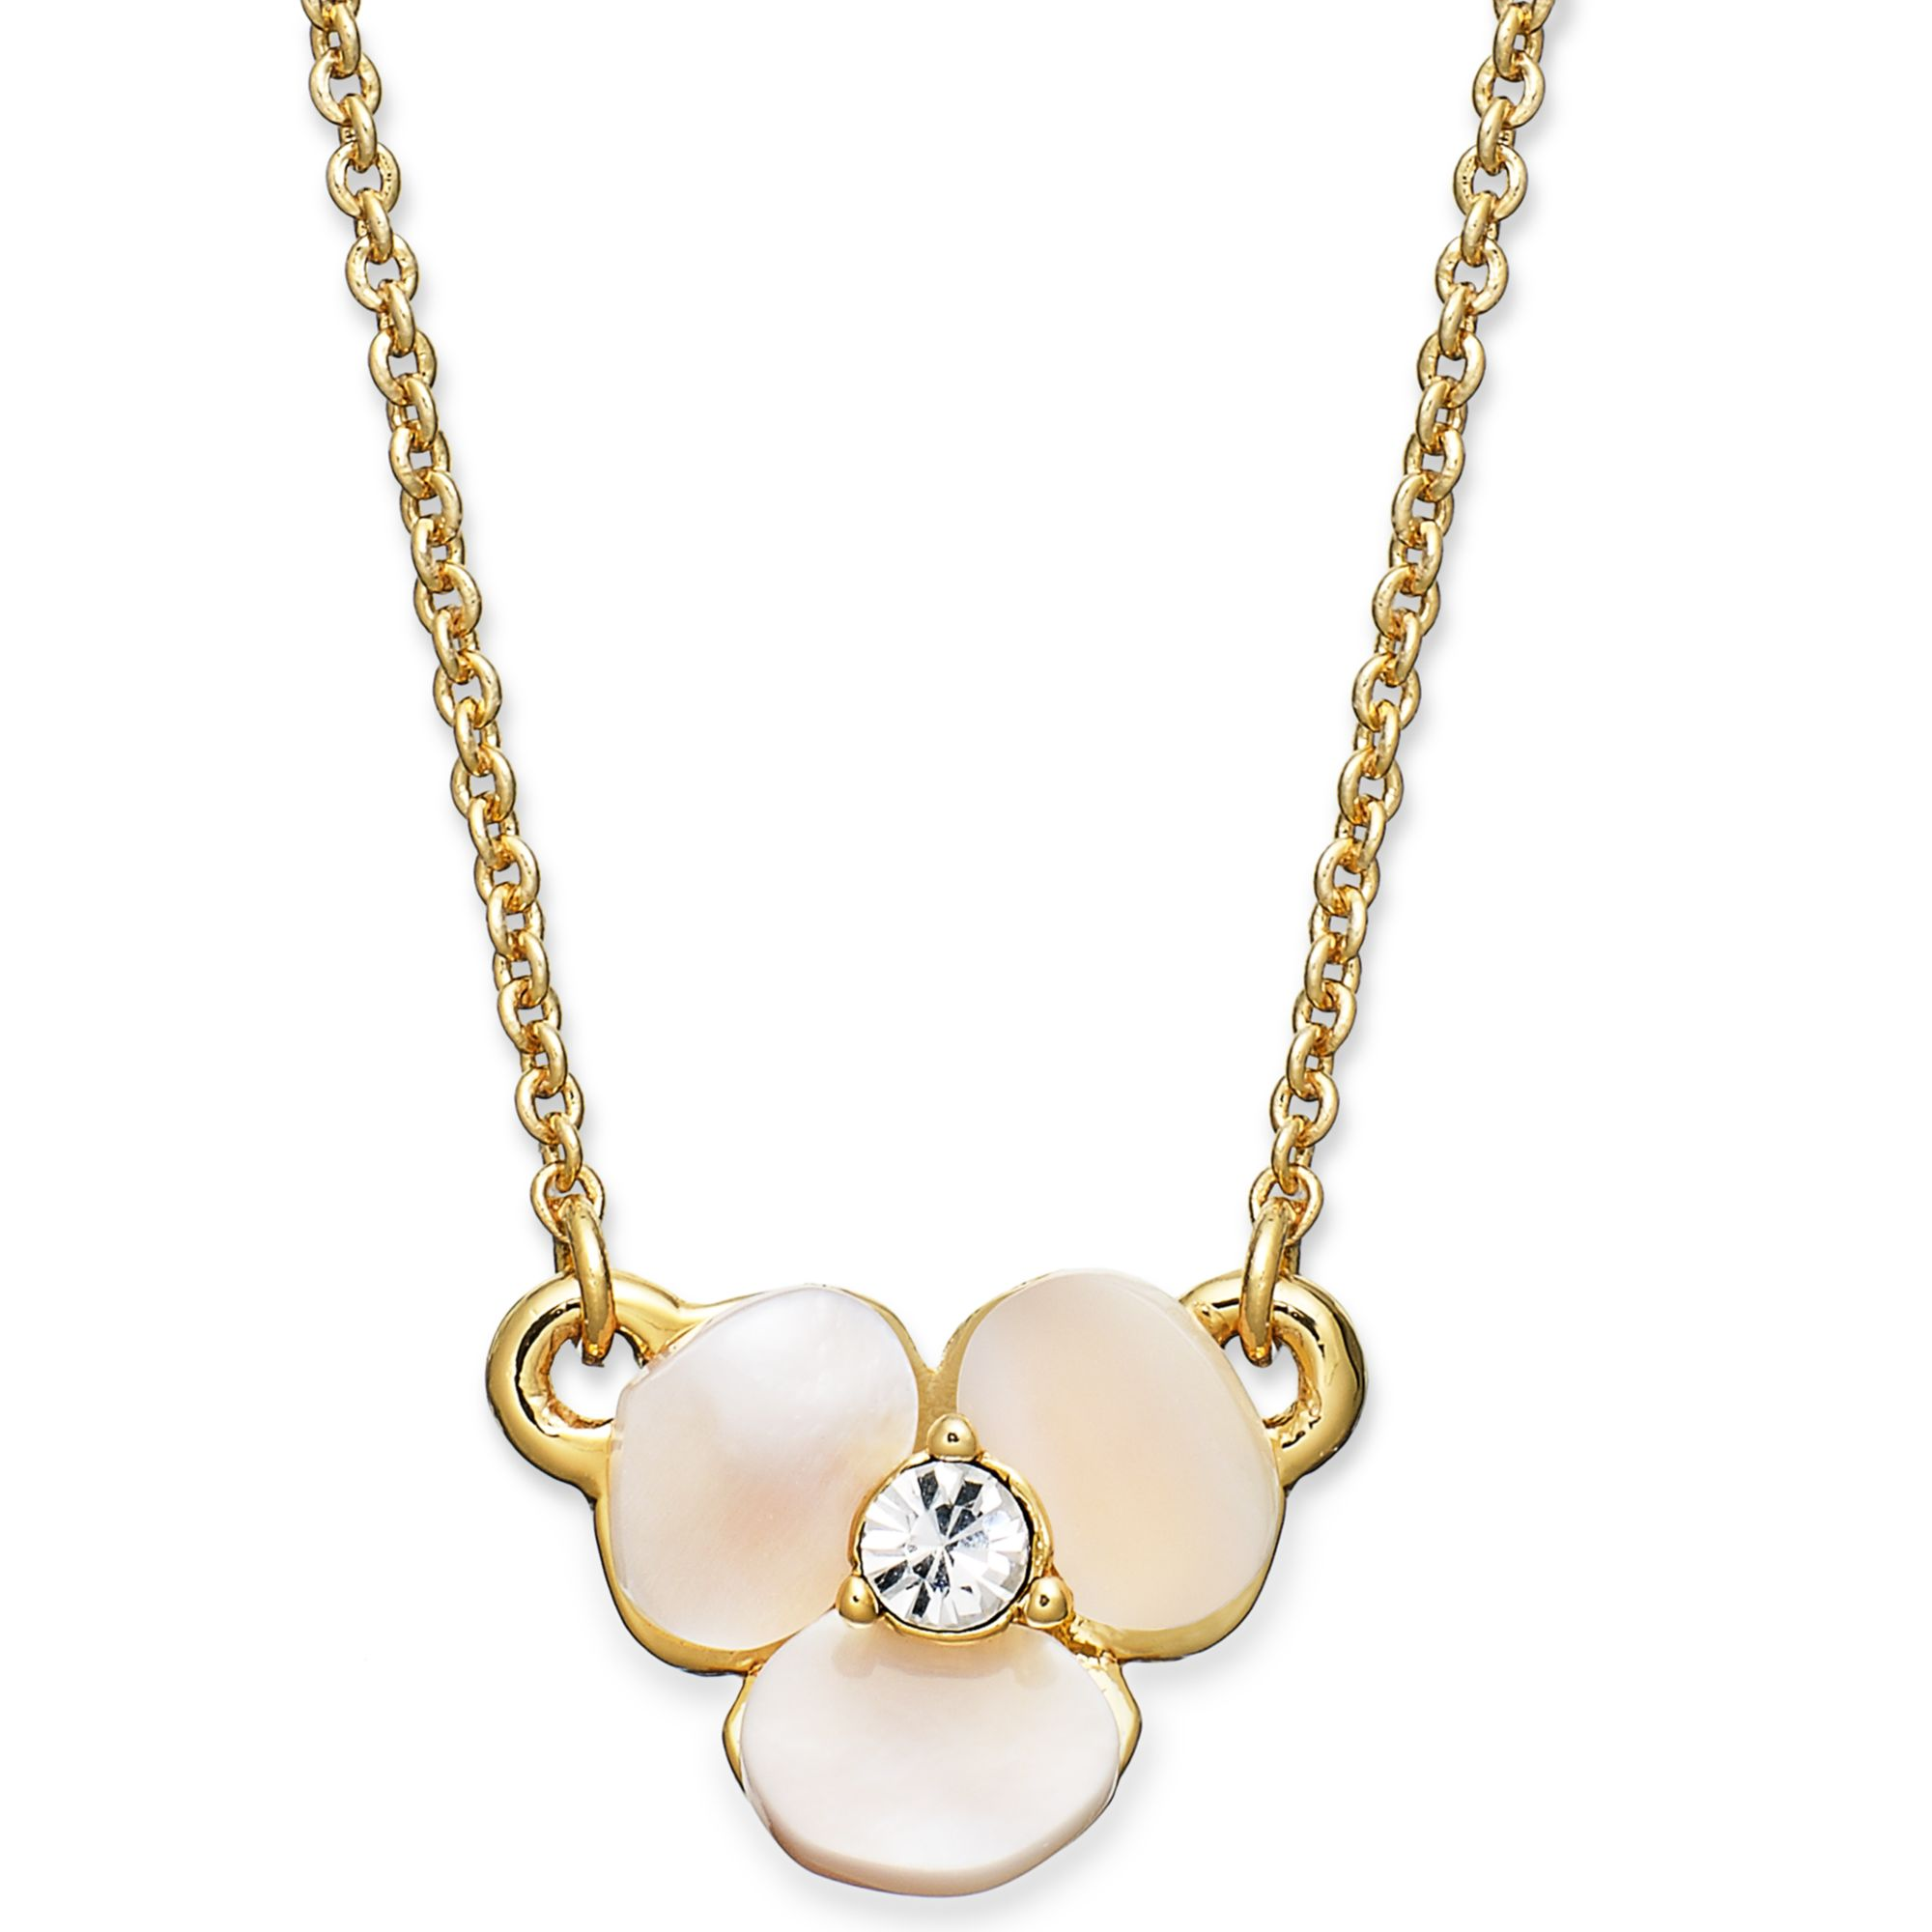 d166dc16f90e1 Kate Spade Metallic Disco Pansy Mother-of-pearl Mini Pendant Necklace